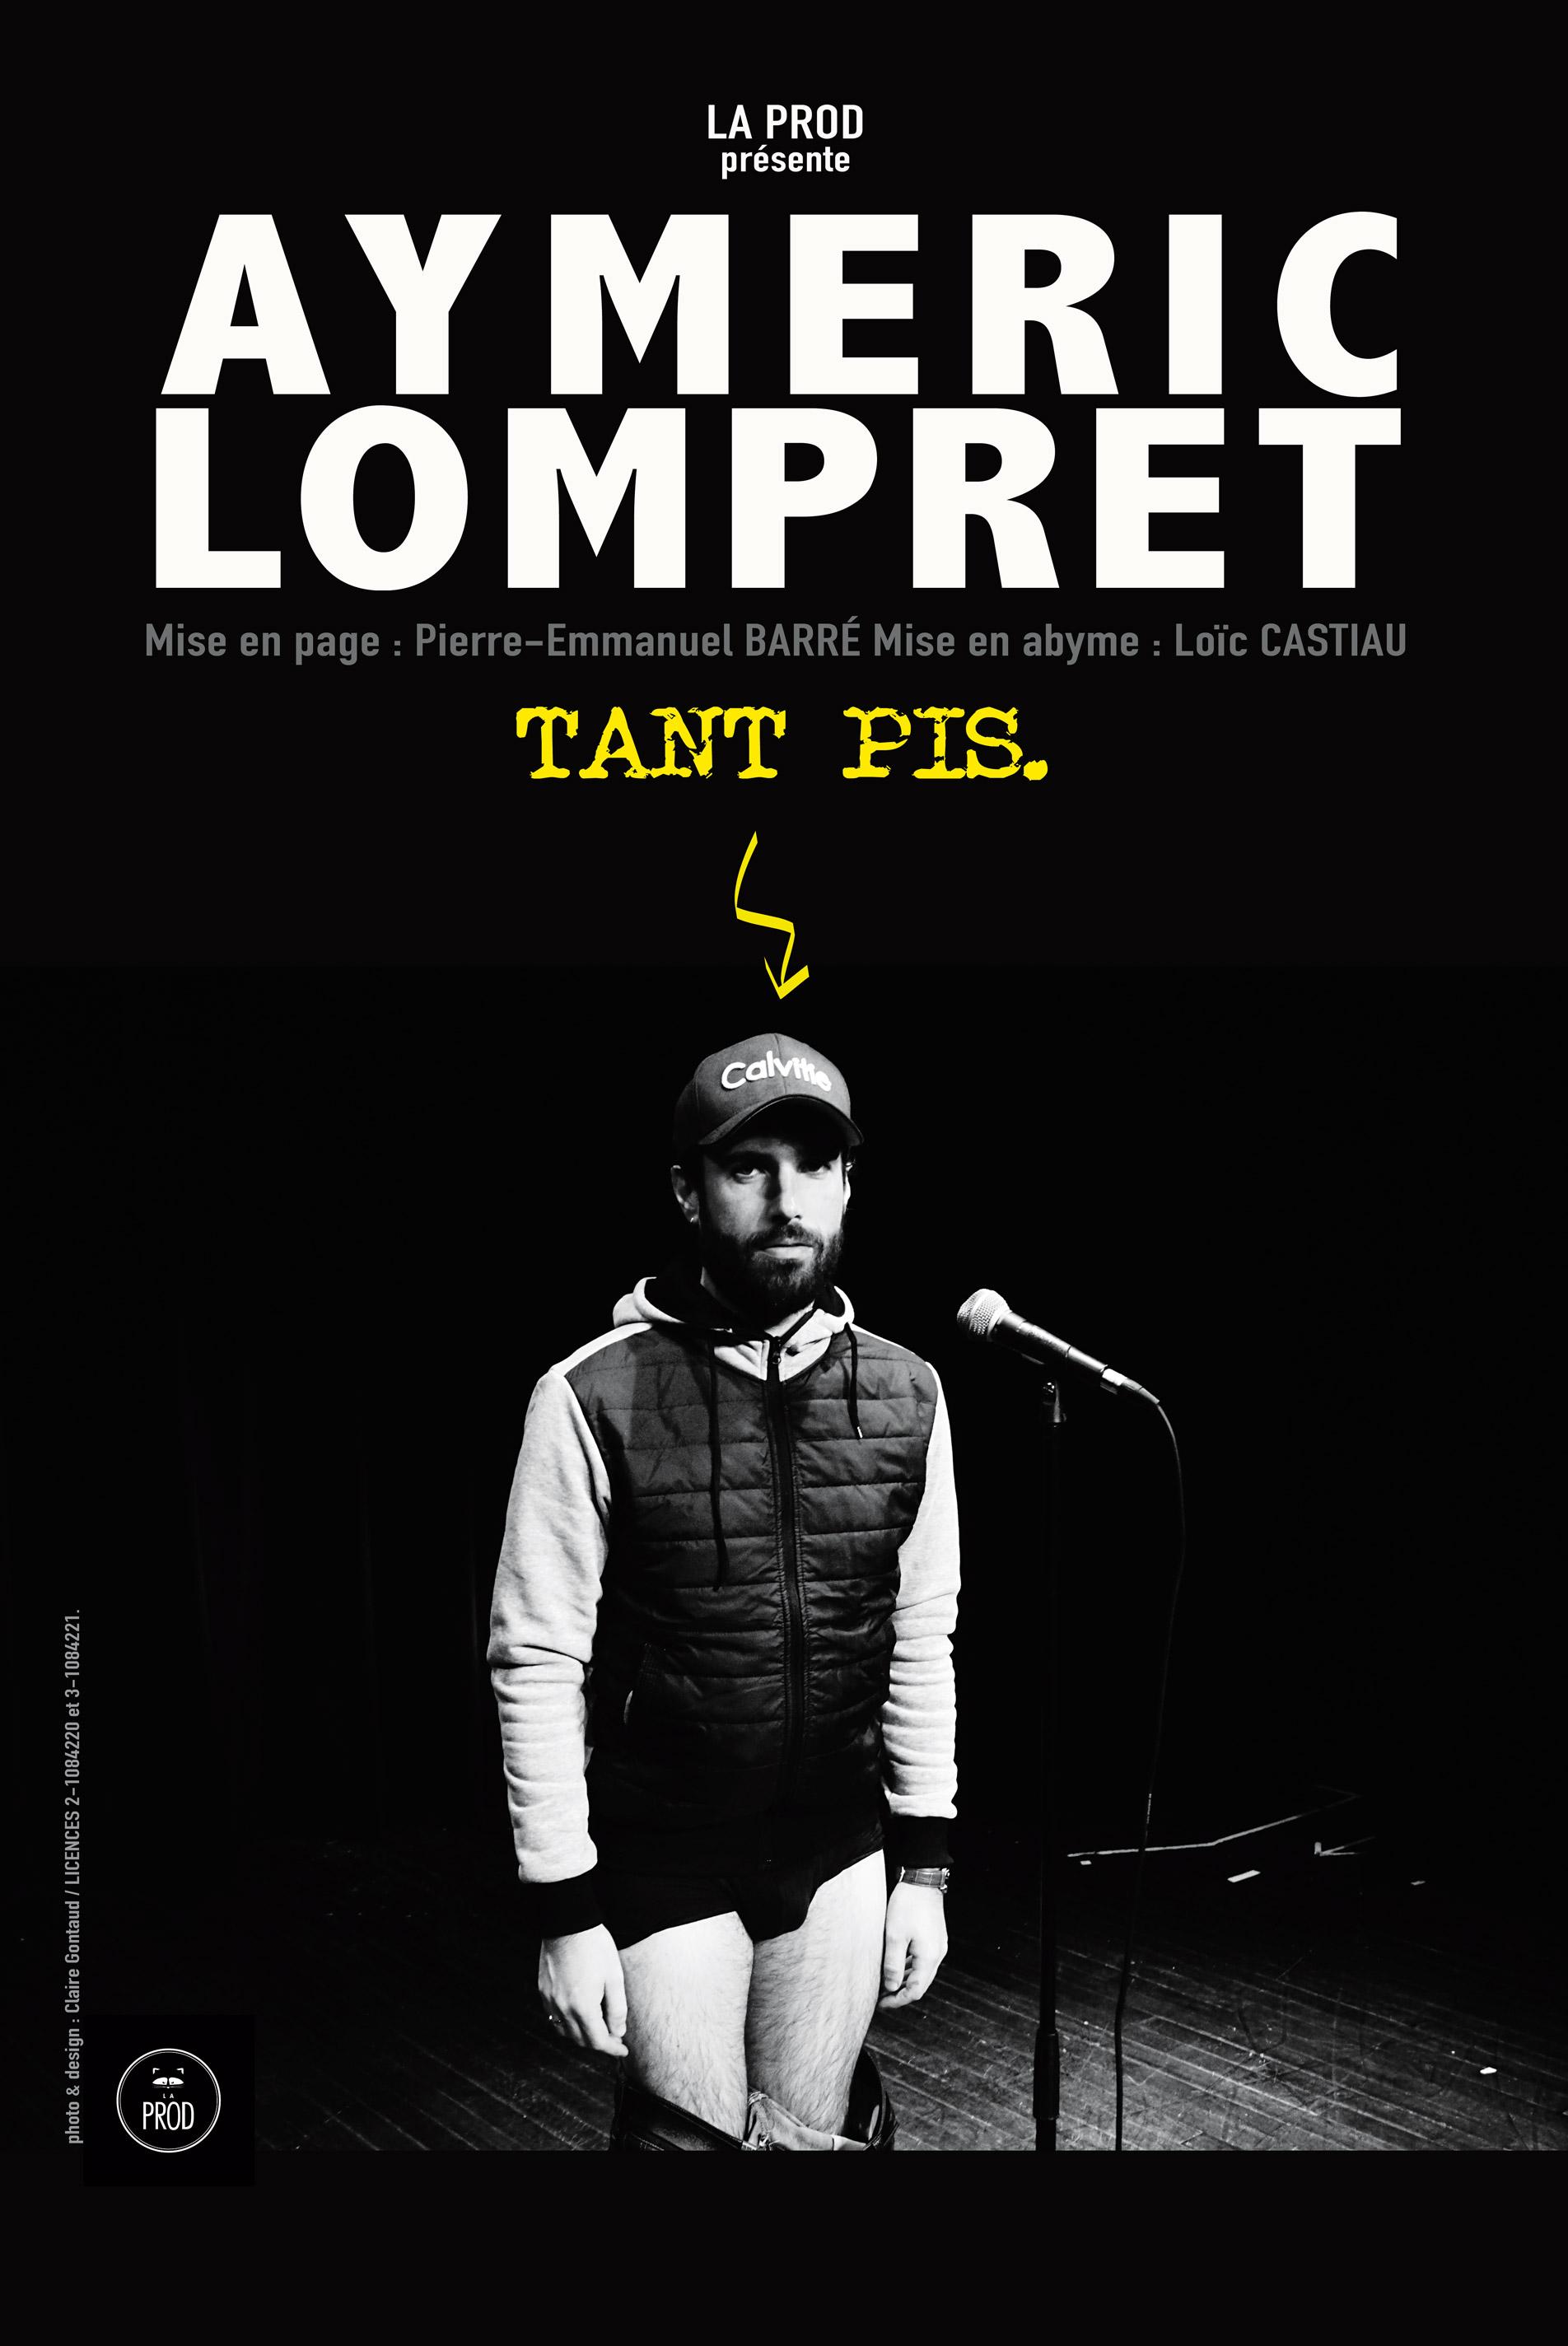 Aymeric-Lompret-One-man-show-Art-Dû-13006